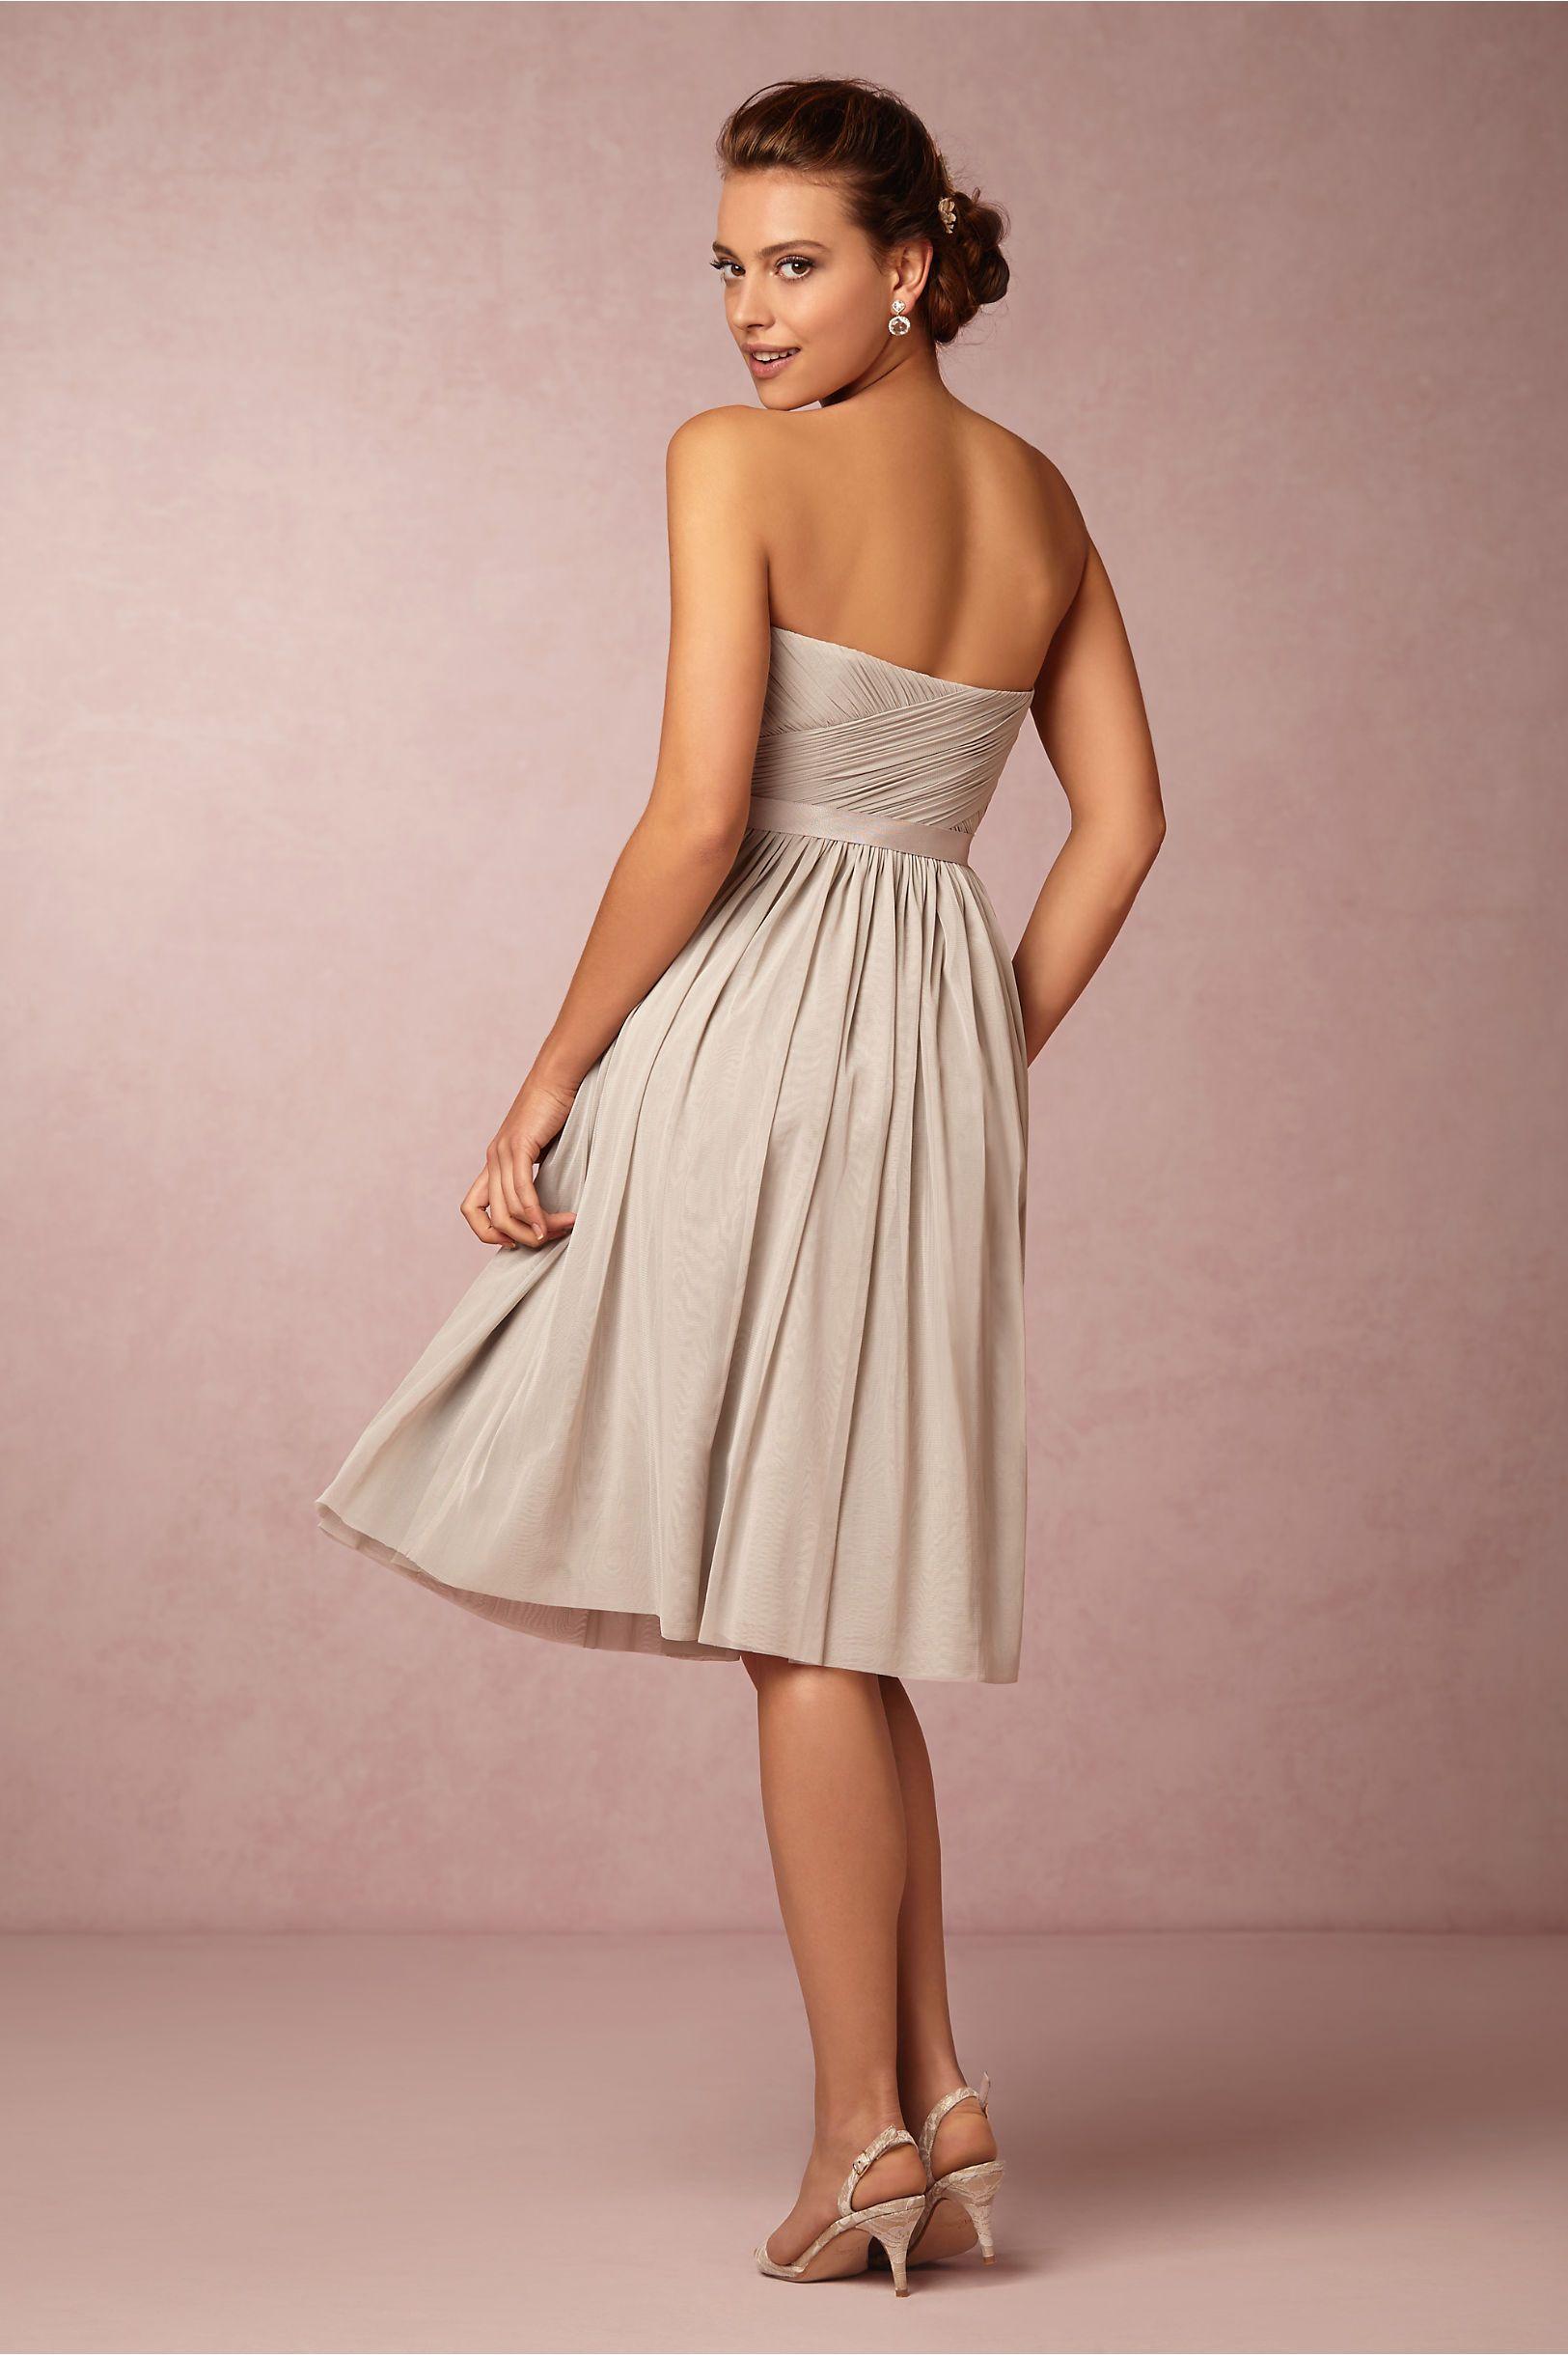 Cordelia Dress From Bhldn